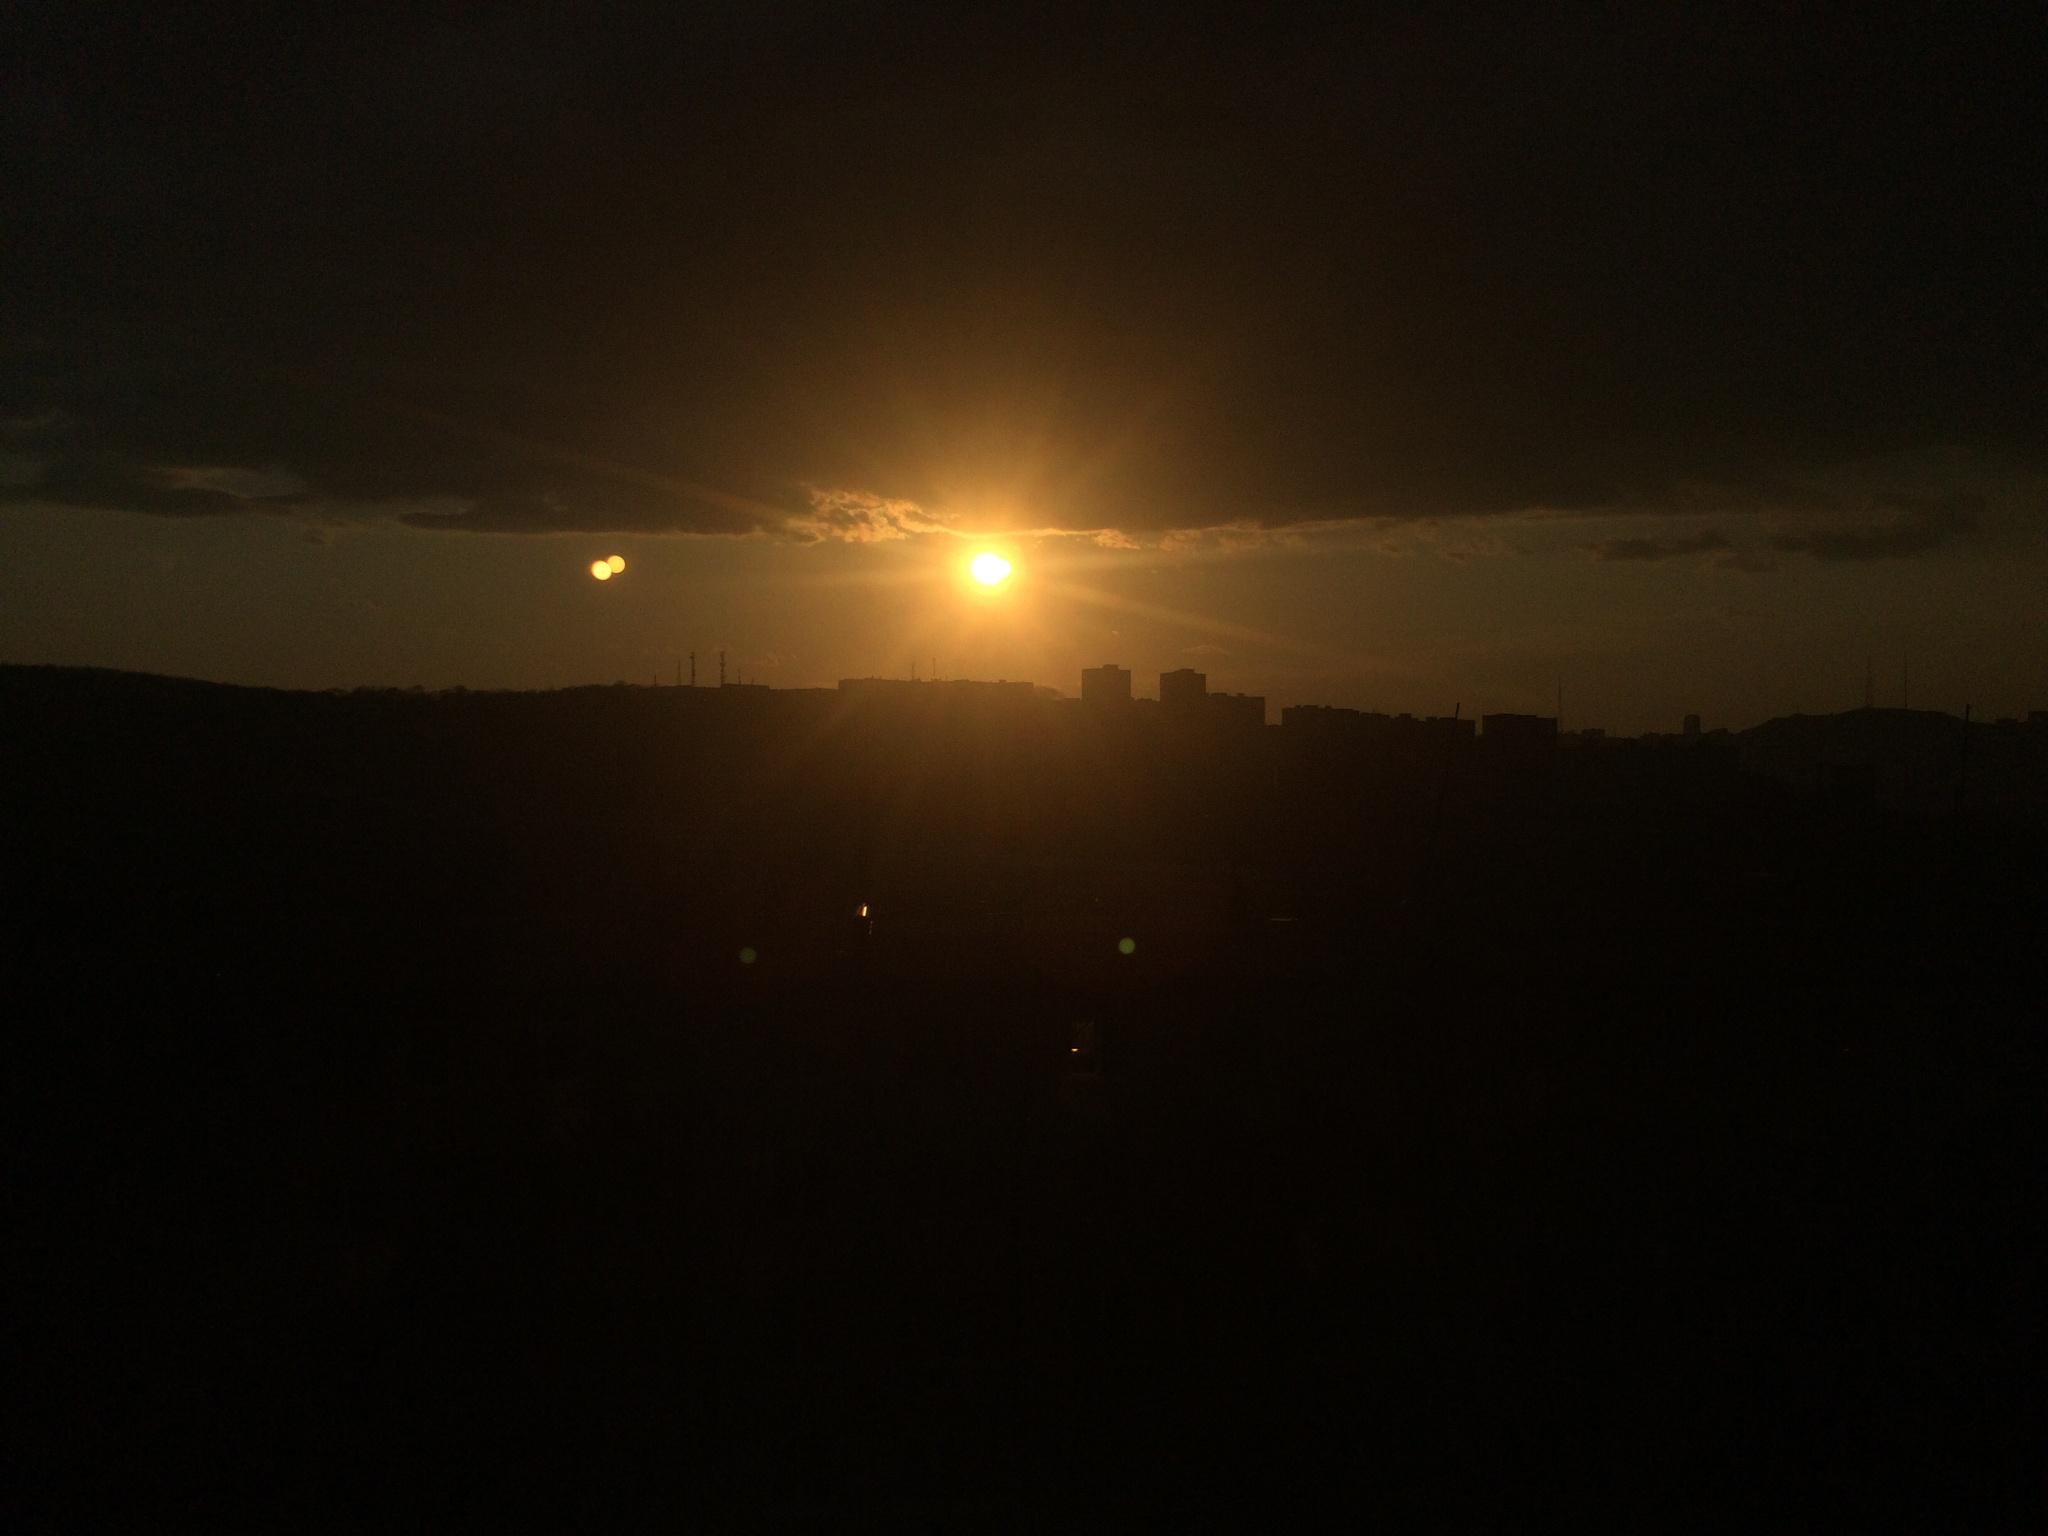 Sunset  by Martin Blum